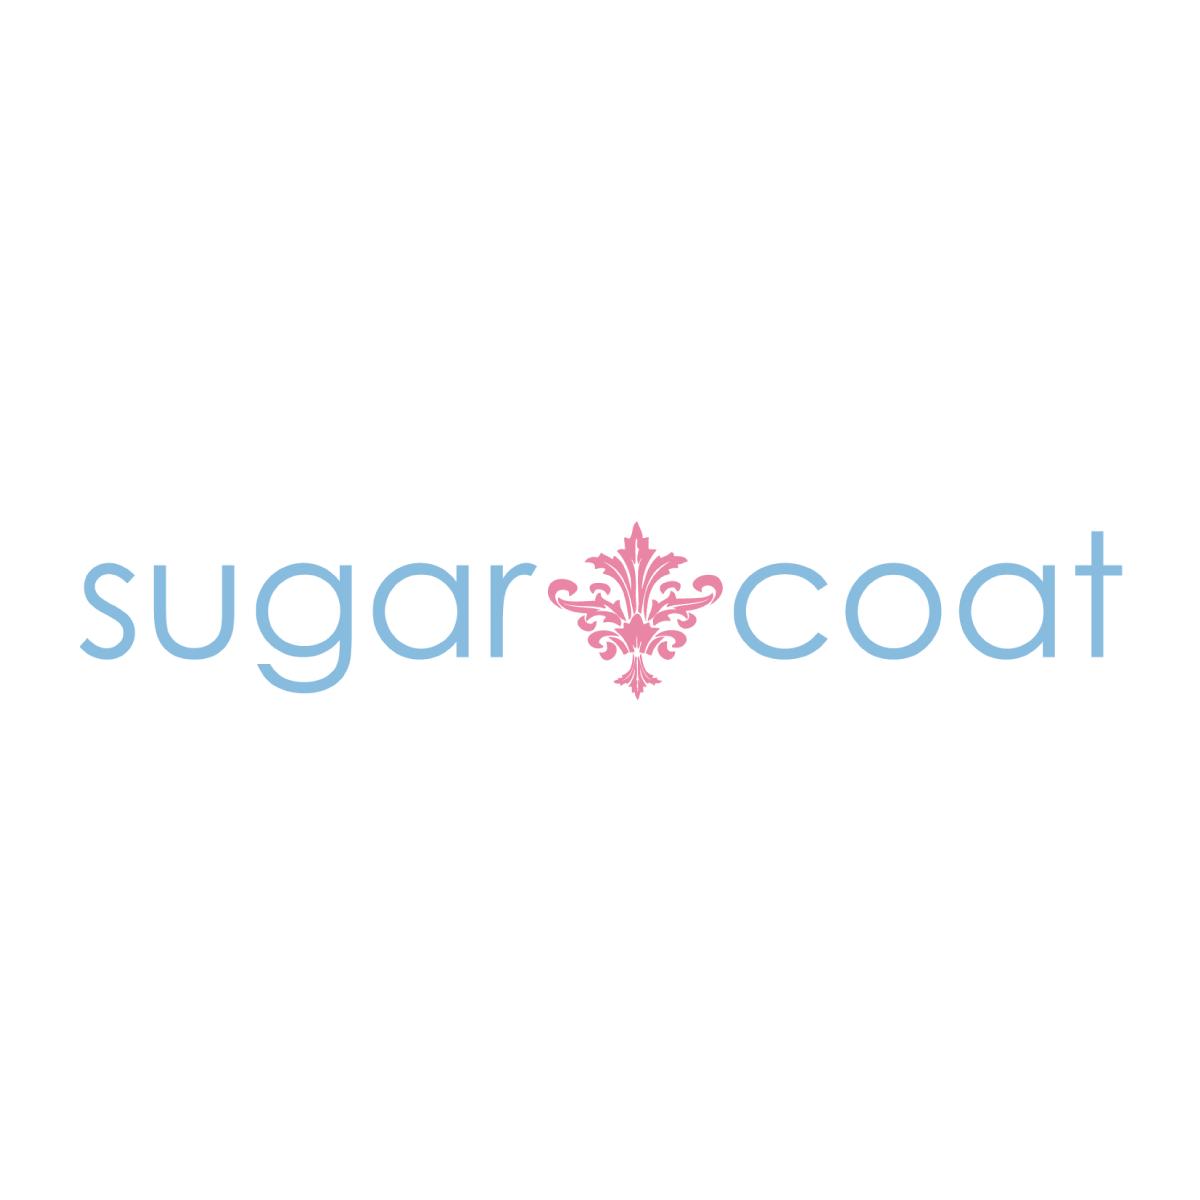 Sucar-Coat-logo-web.png